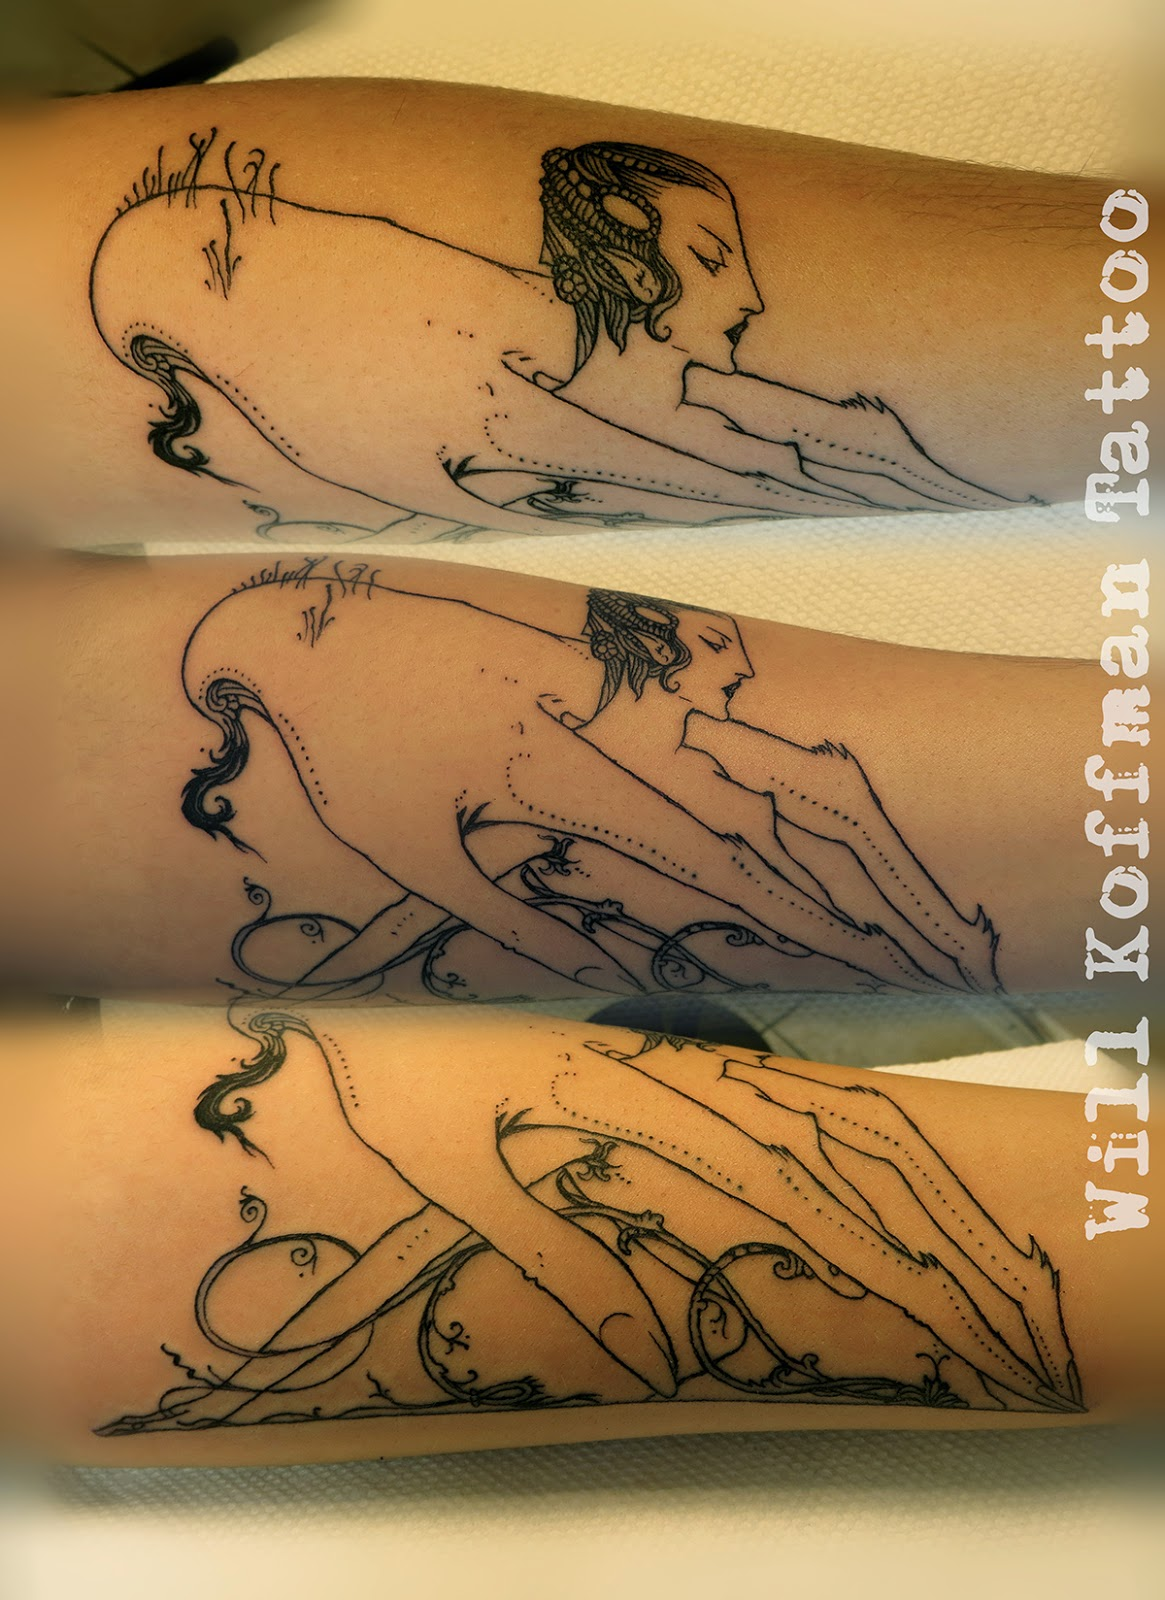 Will koffman tattoo fine line illustration for Tattoo artists orange county